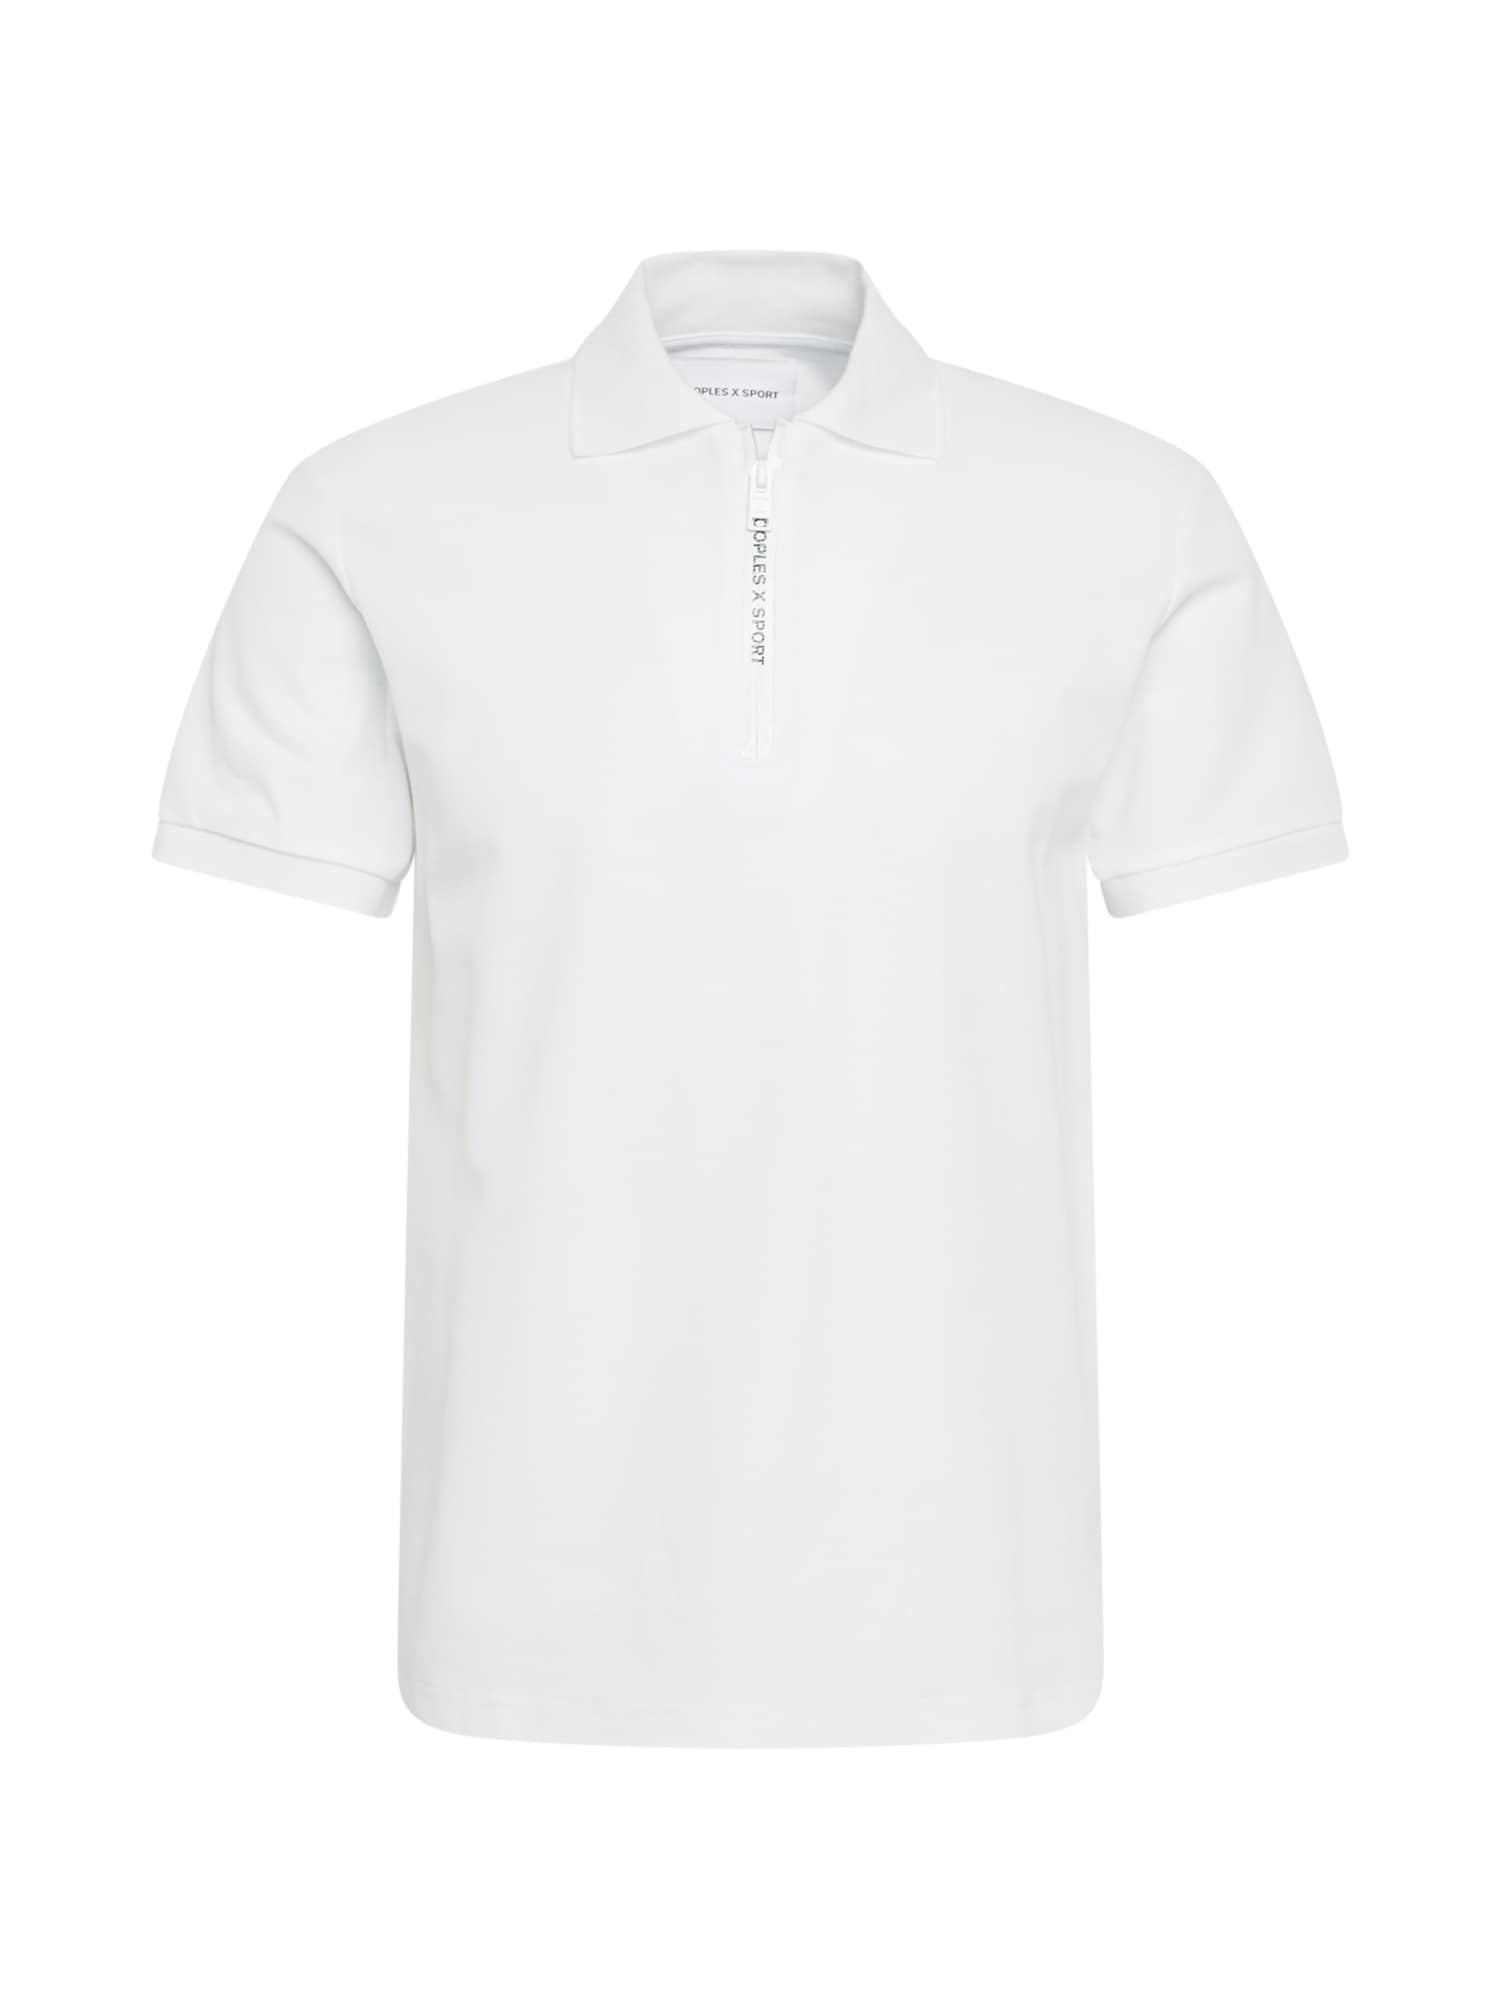 THE KOOPLES SPORT Marškinėliai balta